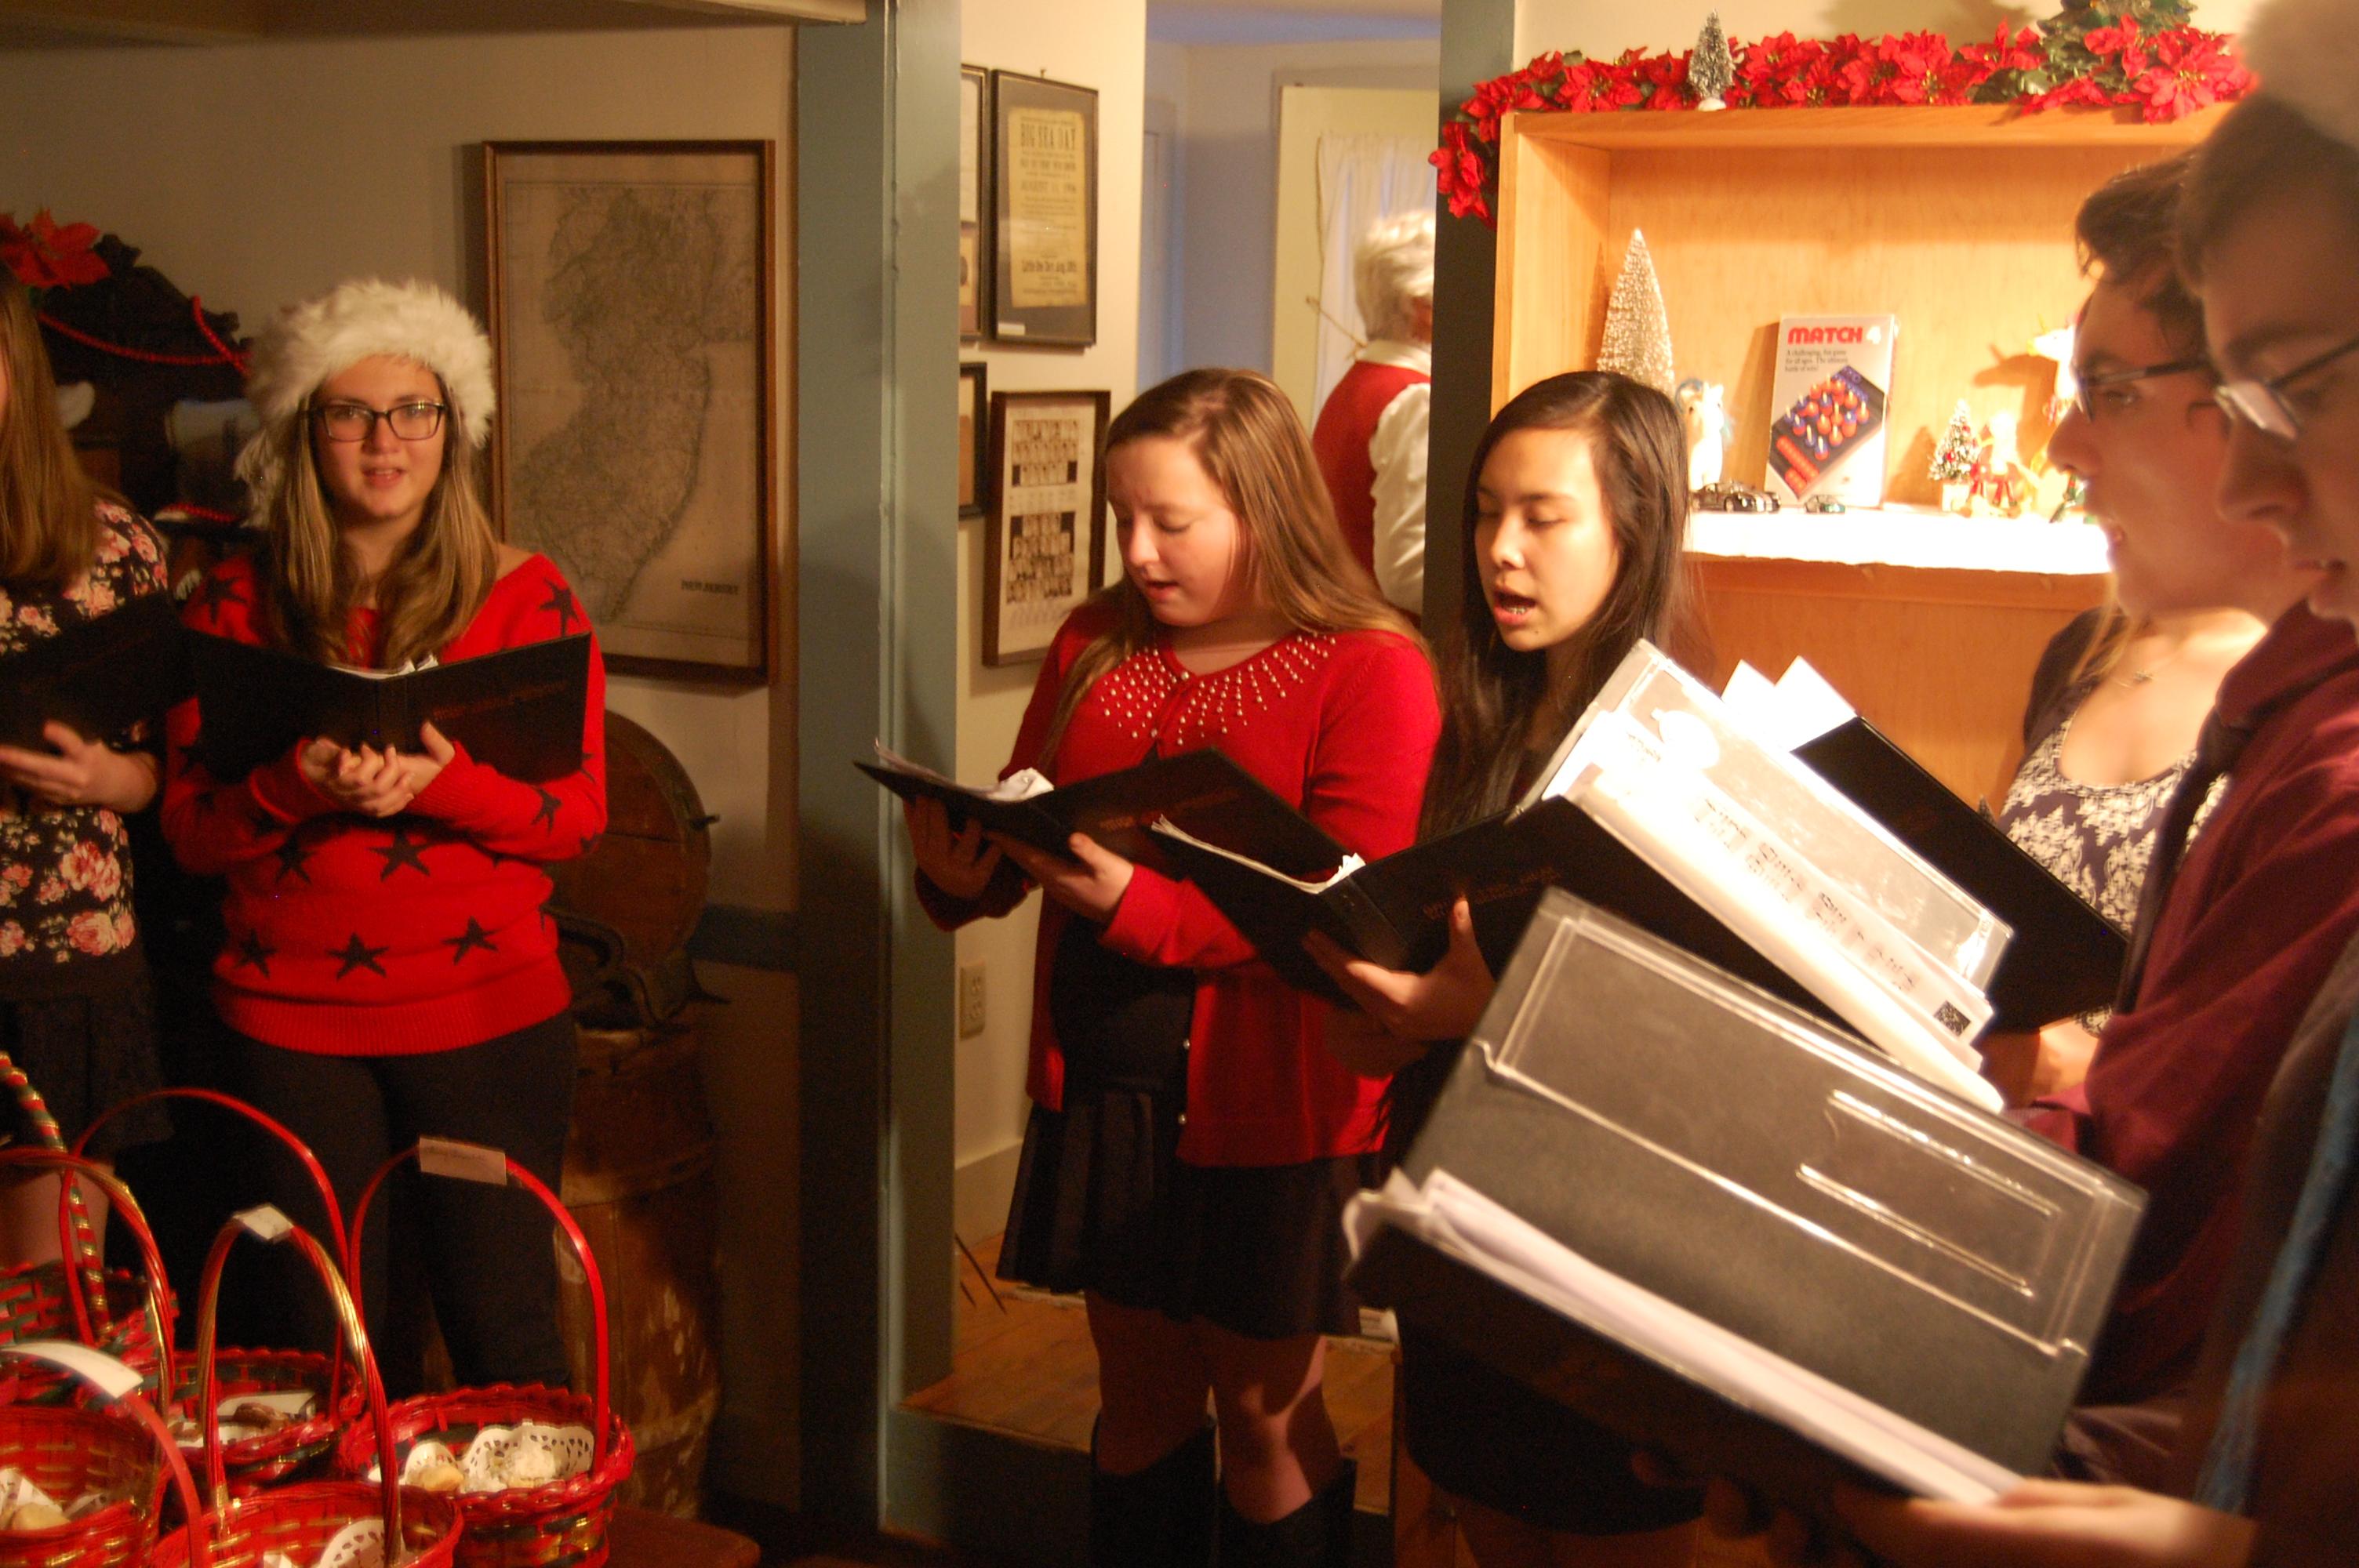 Members of the Brick Memorial High School chorus sing Christmas carols at the Havens Homestead Museum, Dec. 5, 2014. (Photo: Daniel Nee)